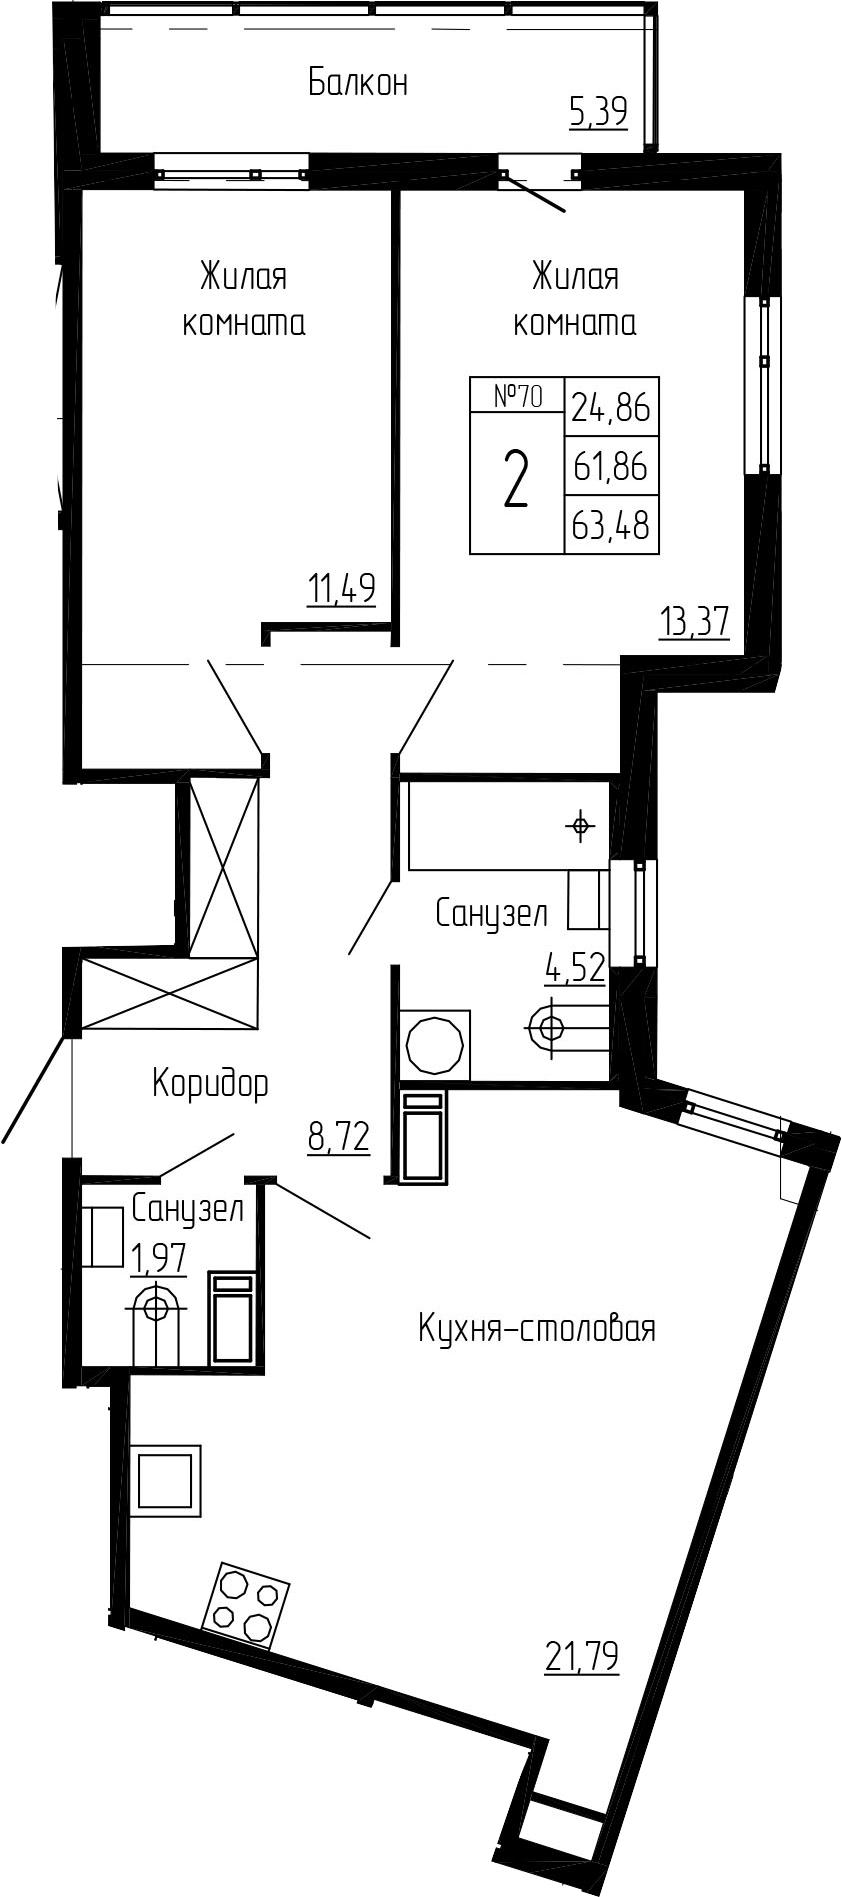 3Е-к.кв, 63.48 м²